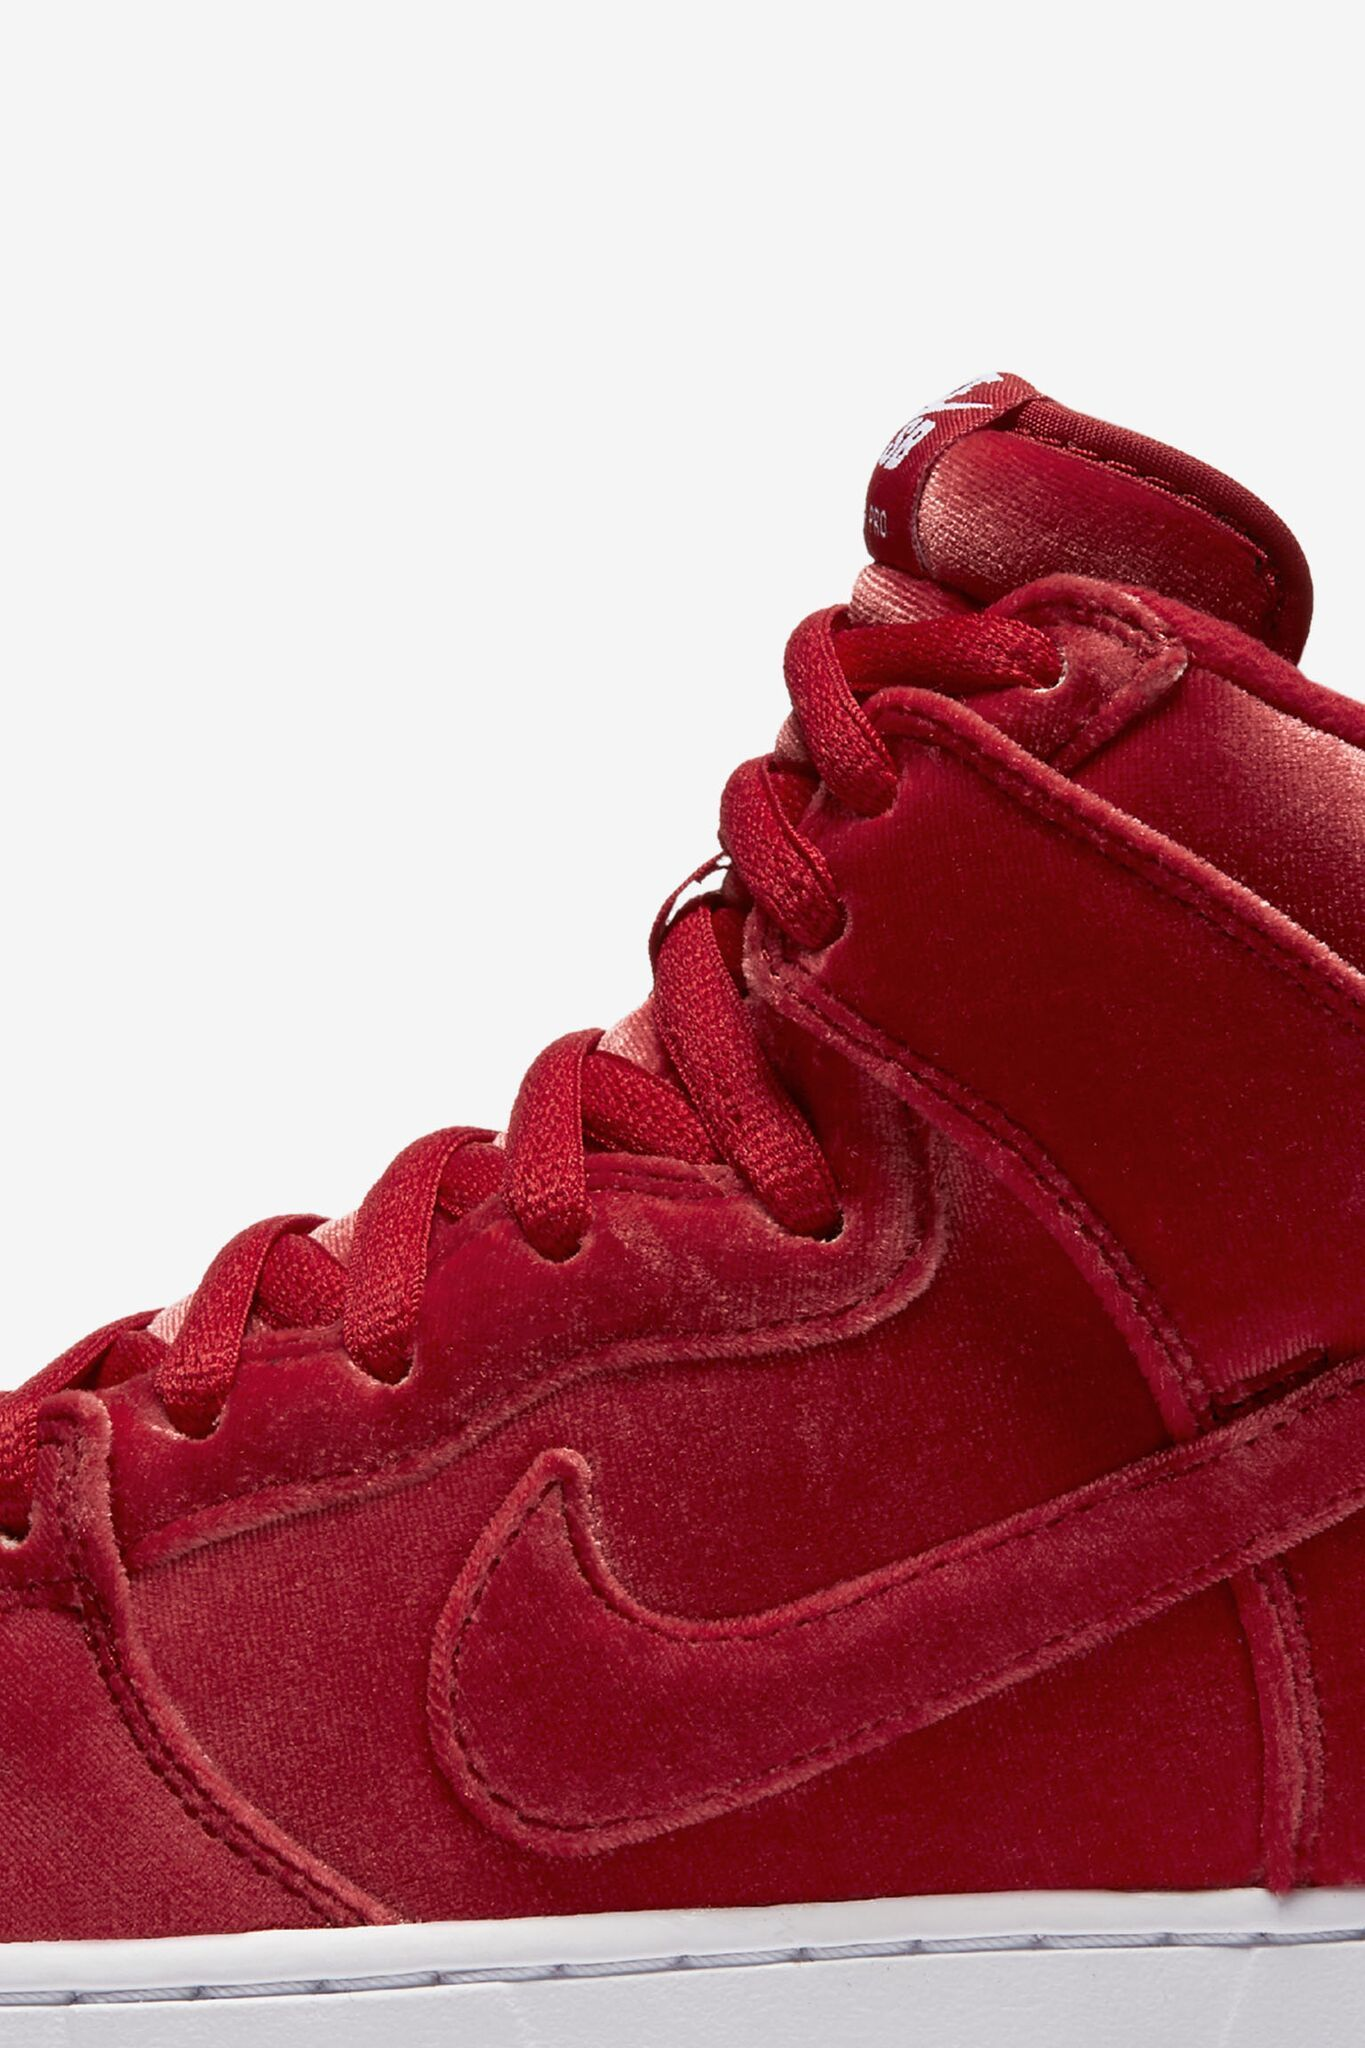 987f9f245e1 ... canada nike sb dunk high premium red velvet. 40579 028e0